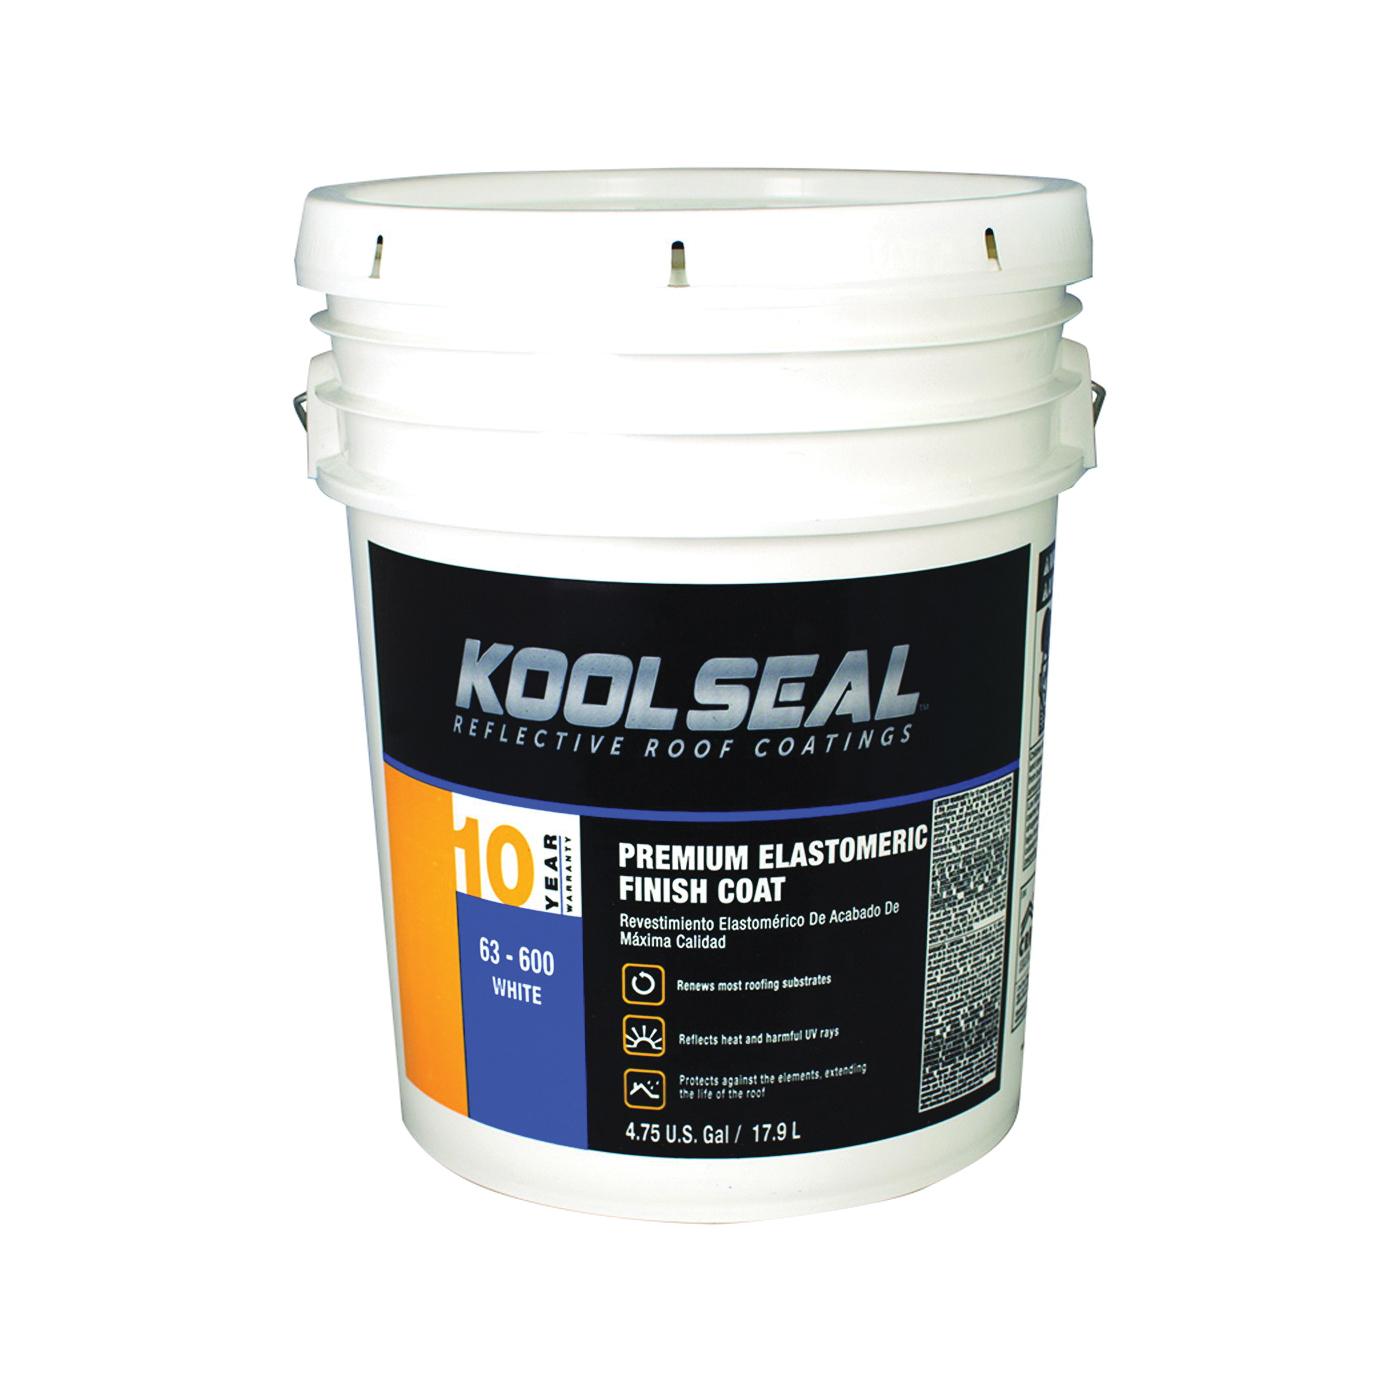 Picture of KOOL SEAL KS0063600-20 Elastomeric Roof Coating, White, 5 gal, Pail, Liquid